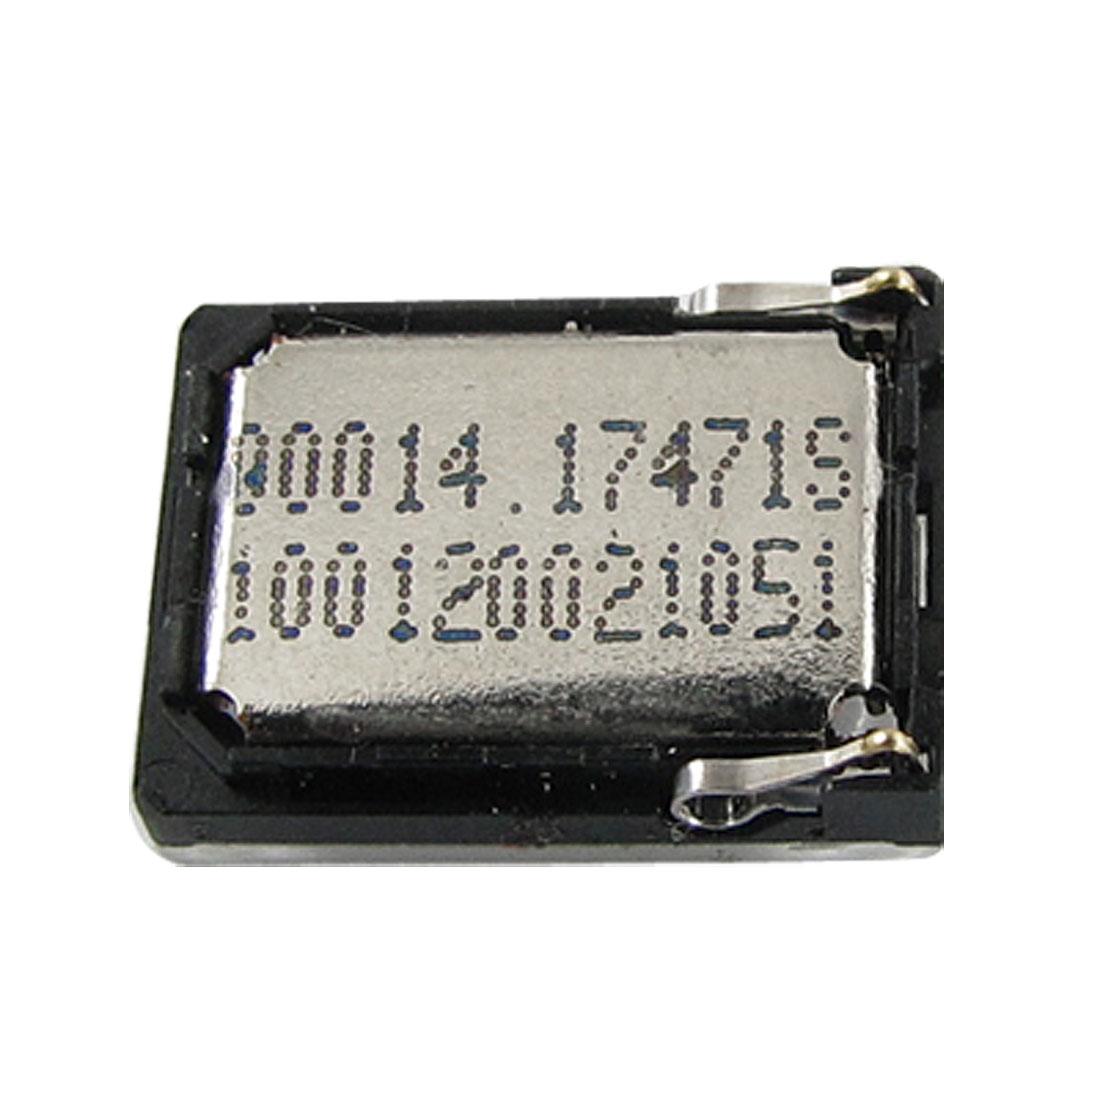 Repairing Part Buzzer Ringer Loudspeaker for Nokia E63